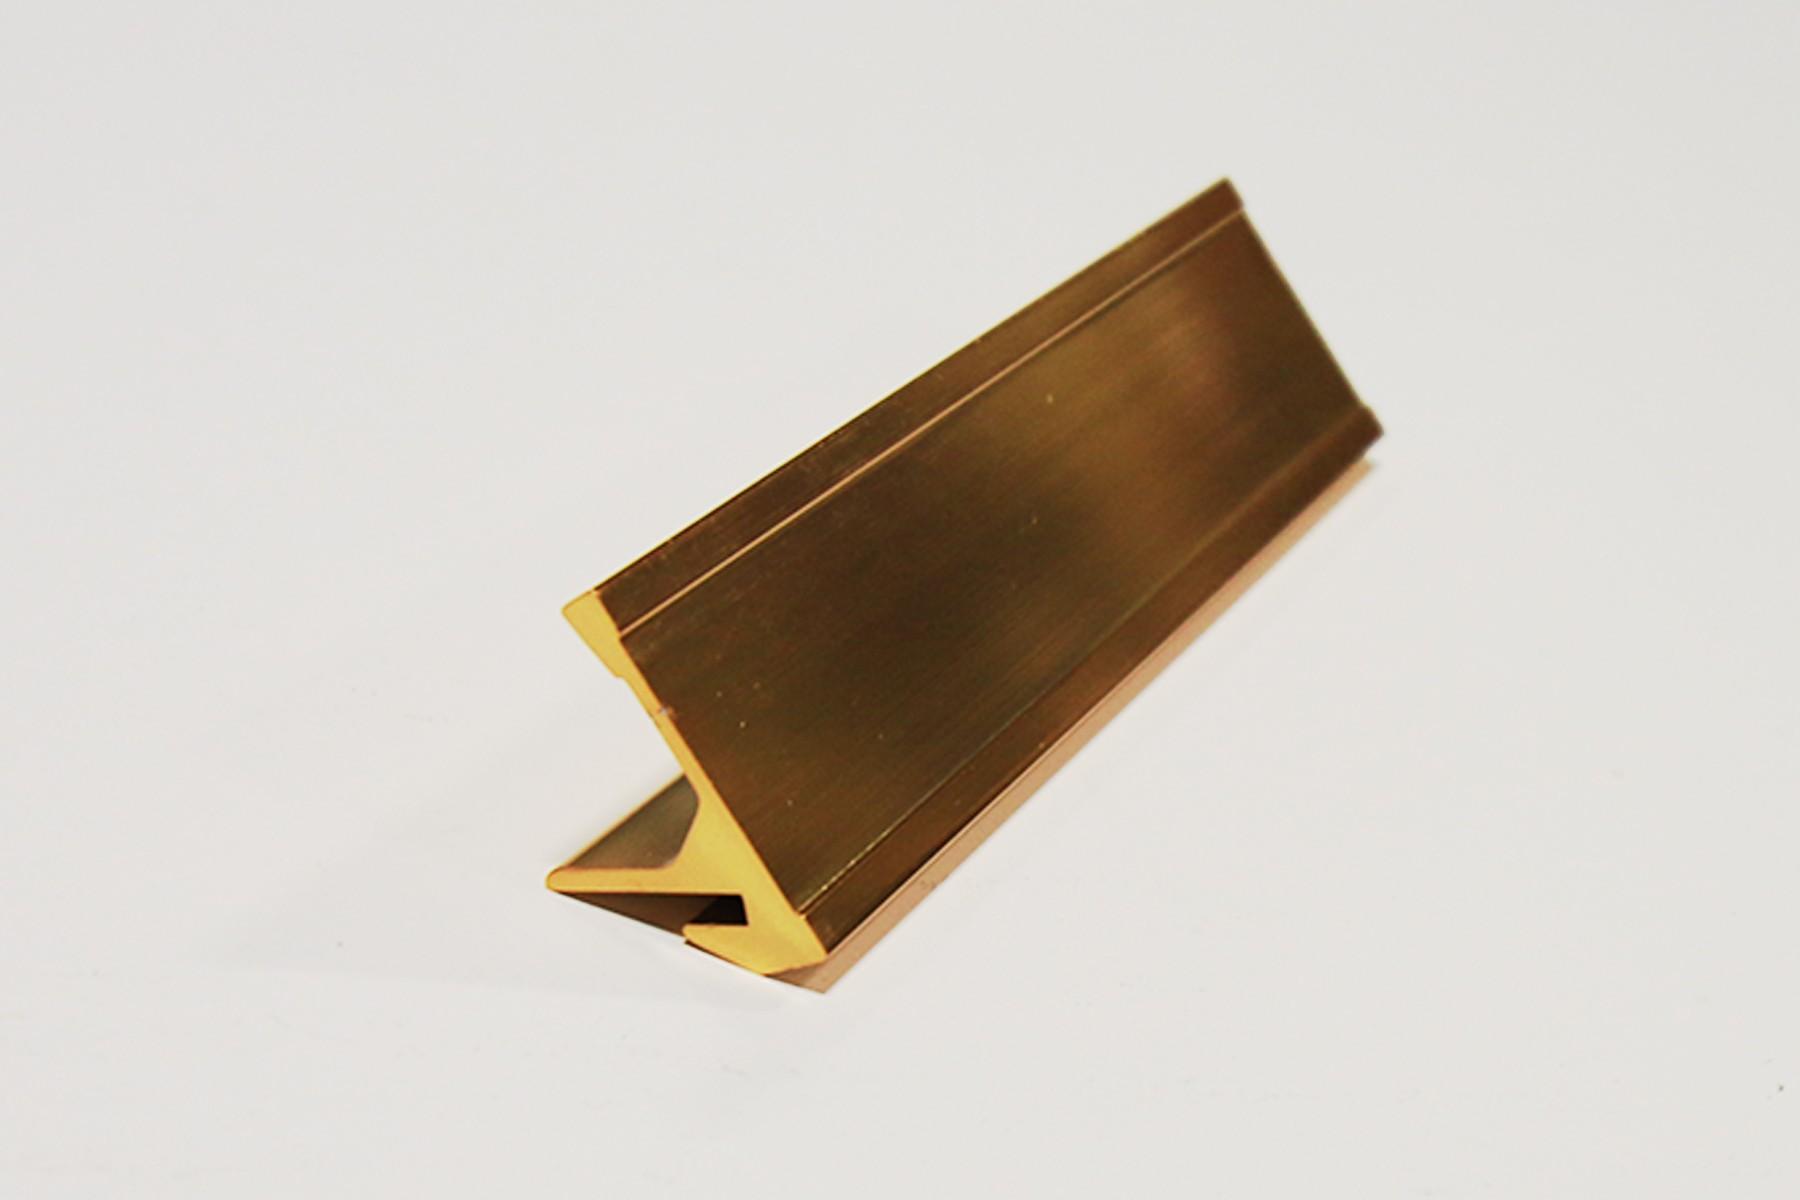 15/16 x 4 Desk Base, Gold